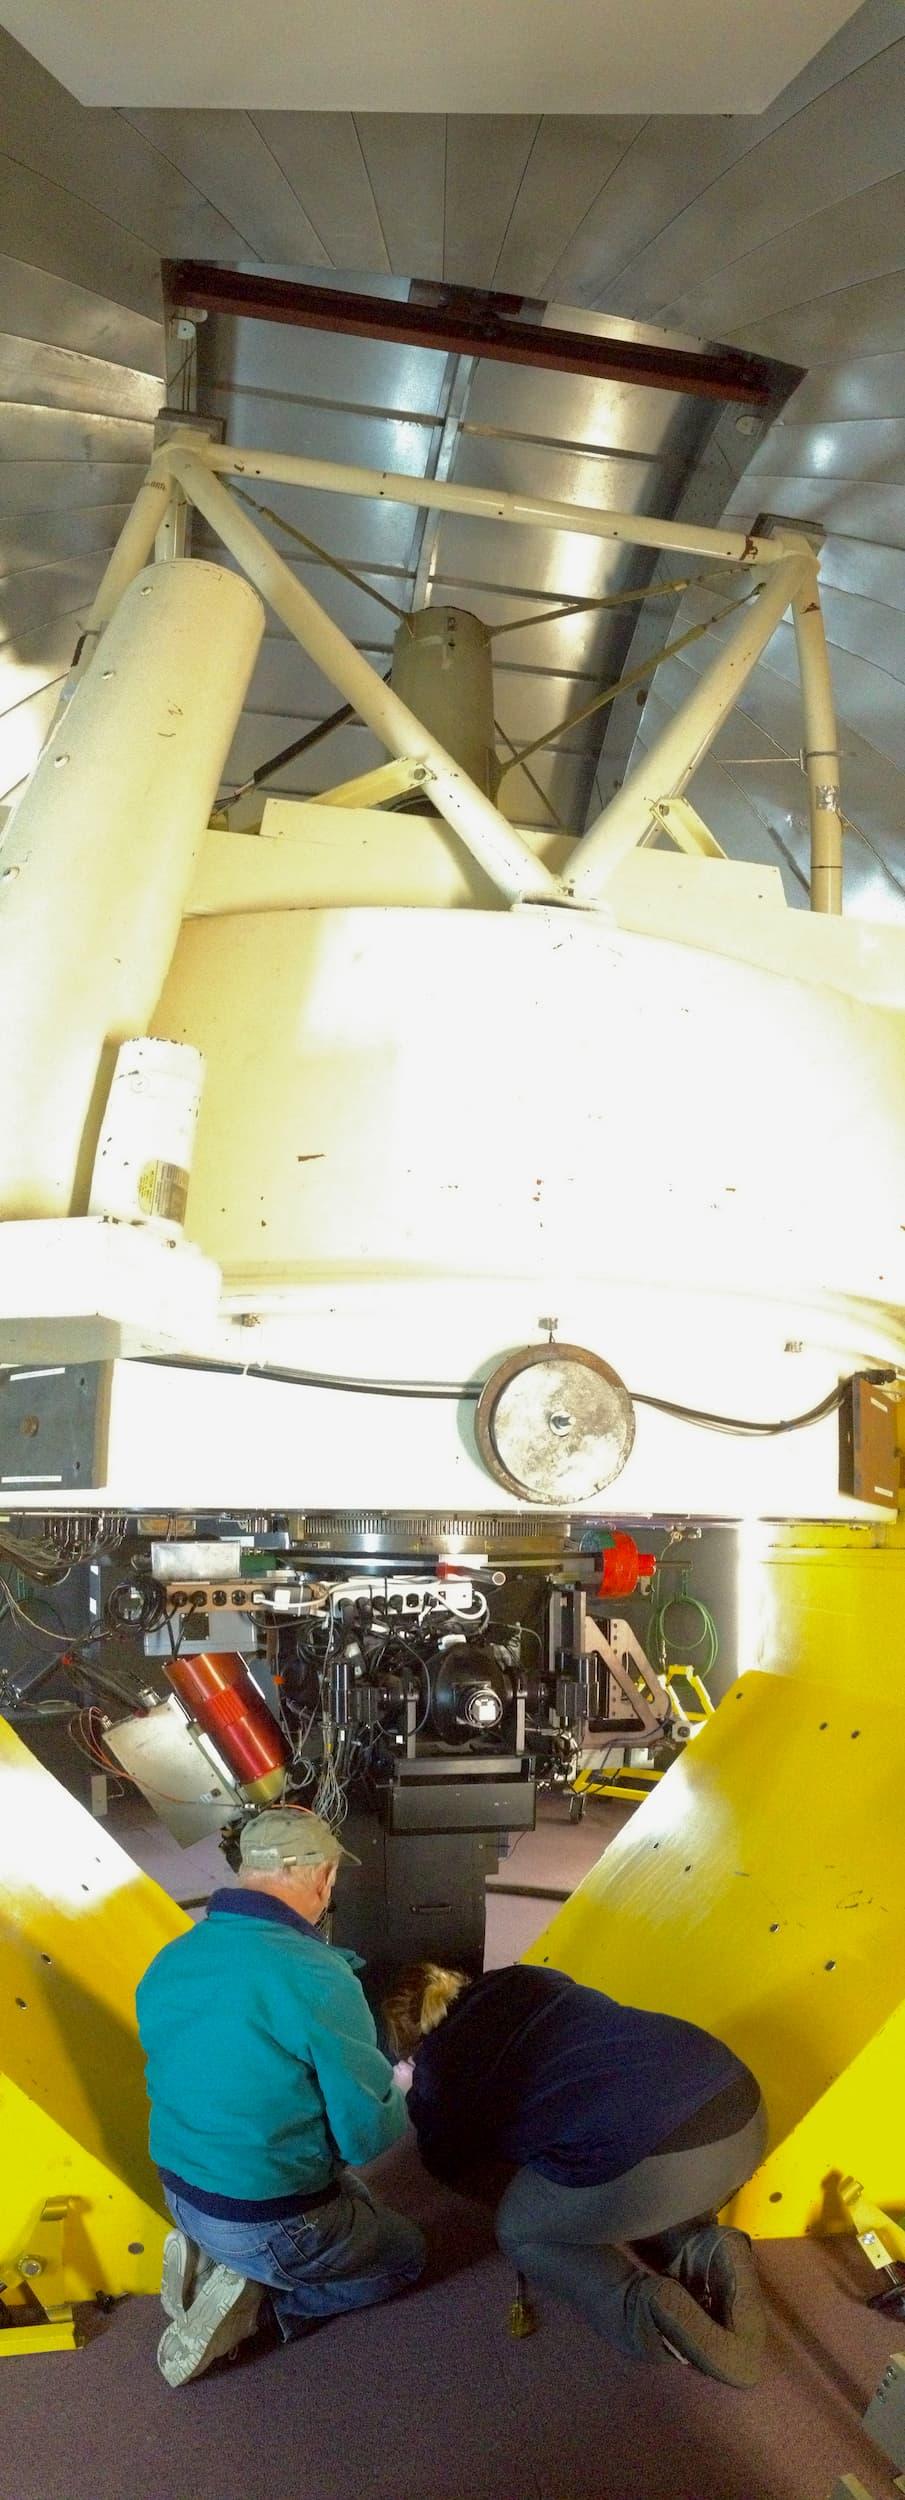 Boyle at the Vatican Advanced Technology Telescope (VATT)